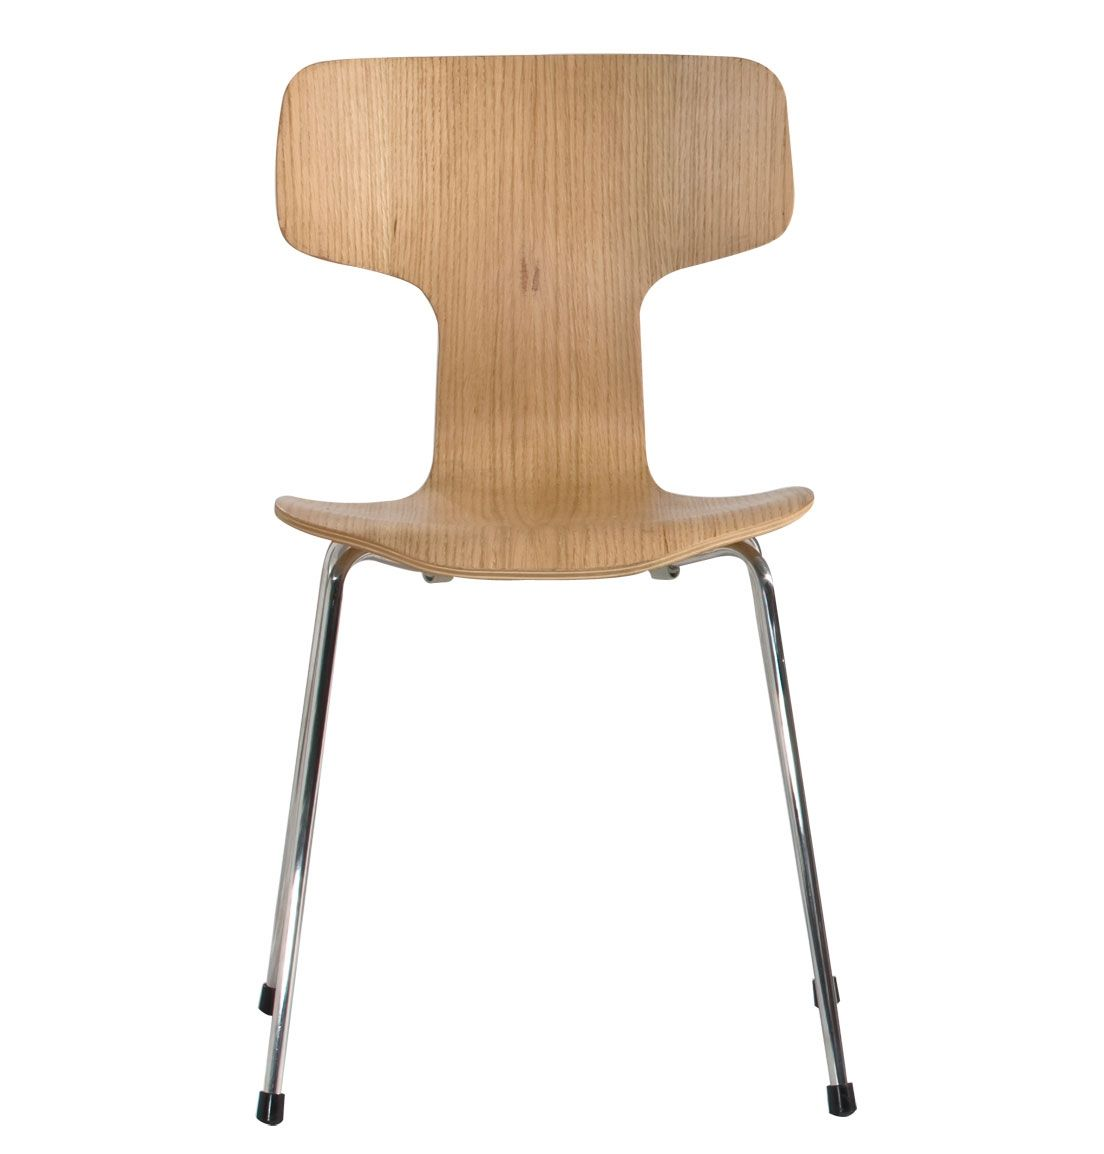 Replica Arne Jacobsen 3103 Chair by Arne Jacobsen - Matt Blatt